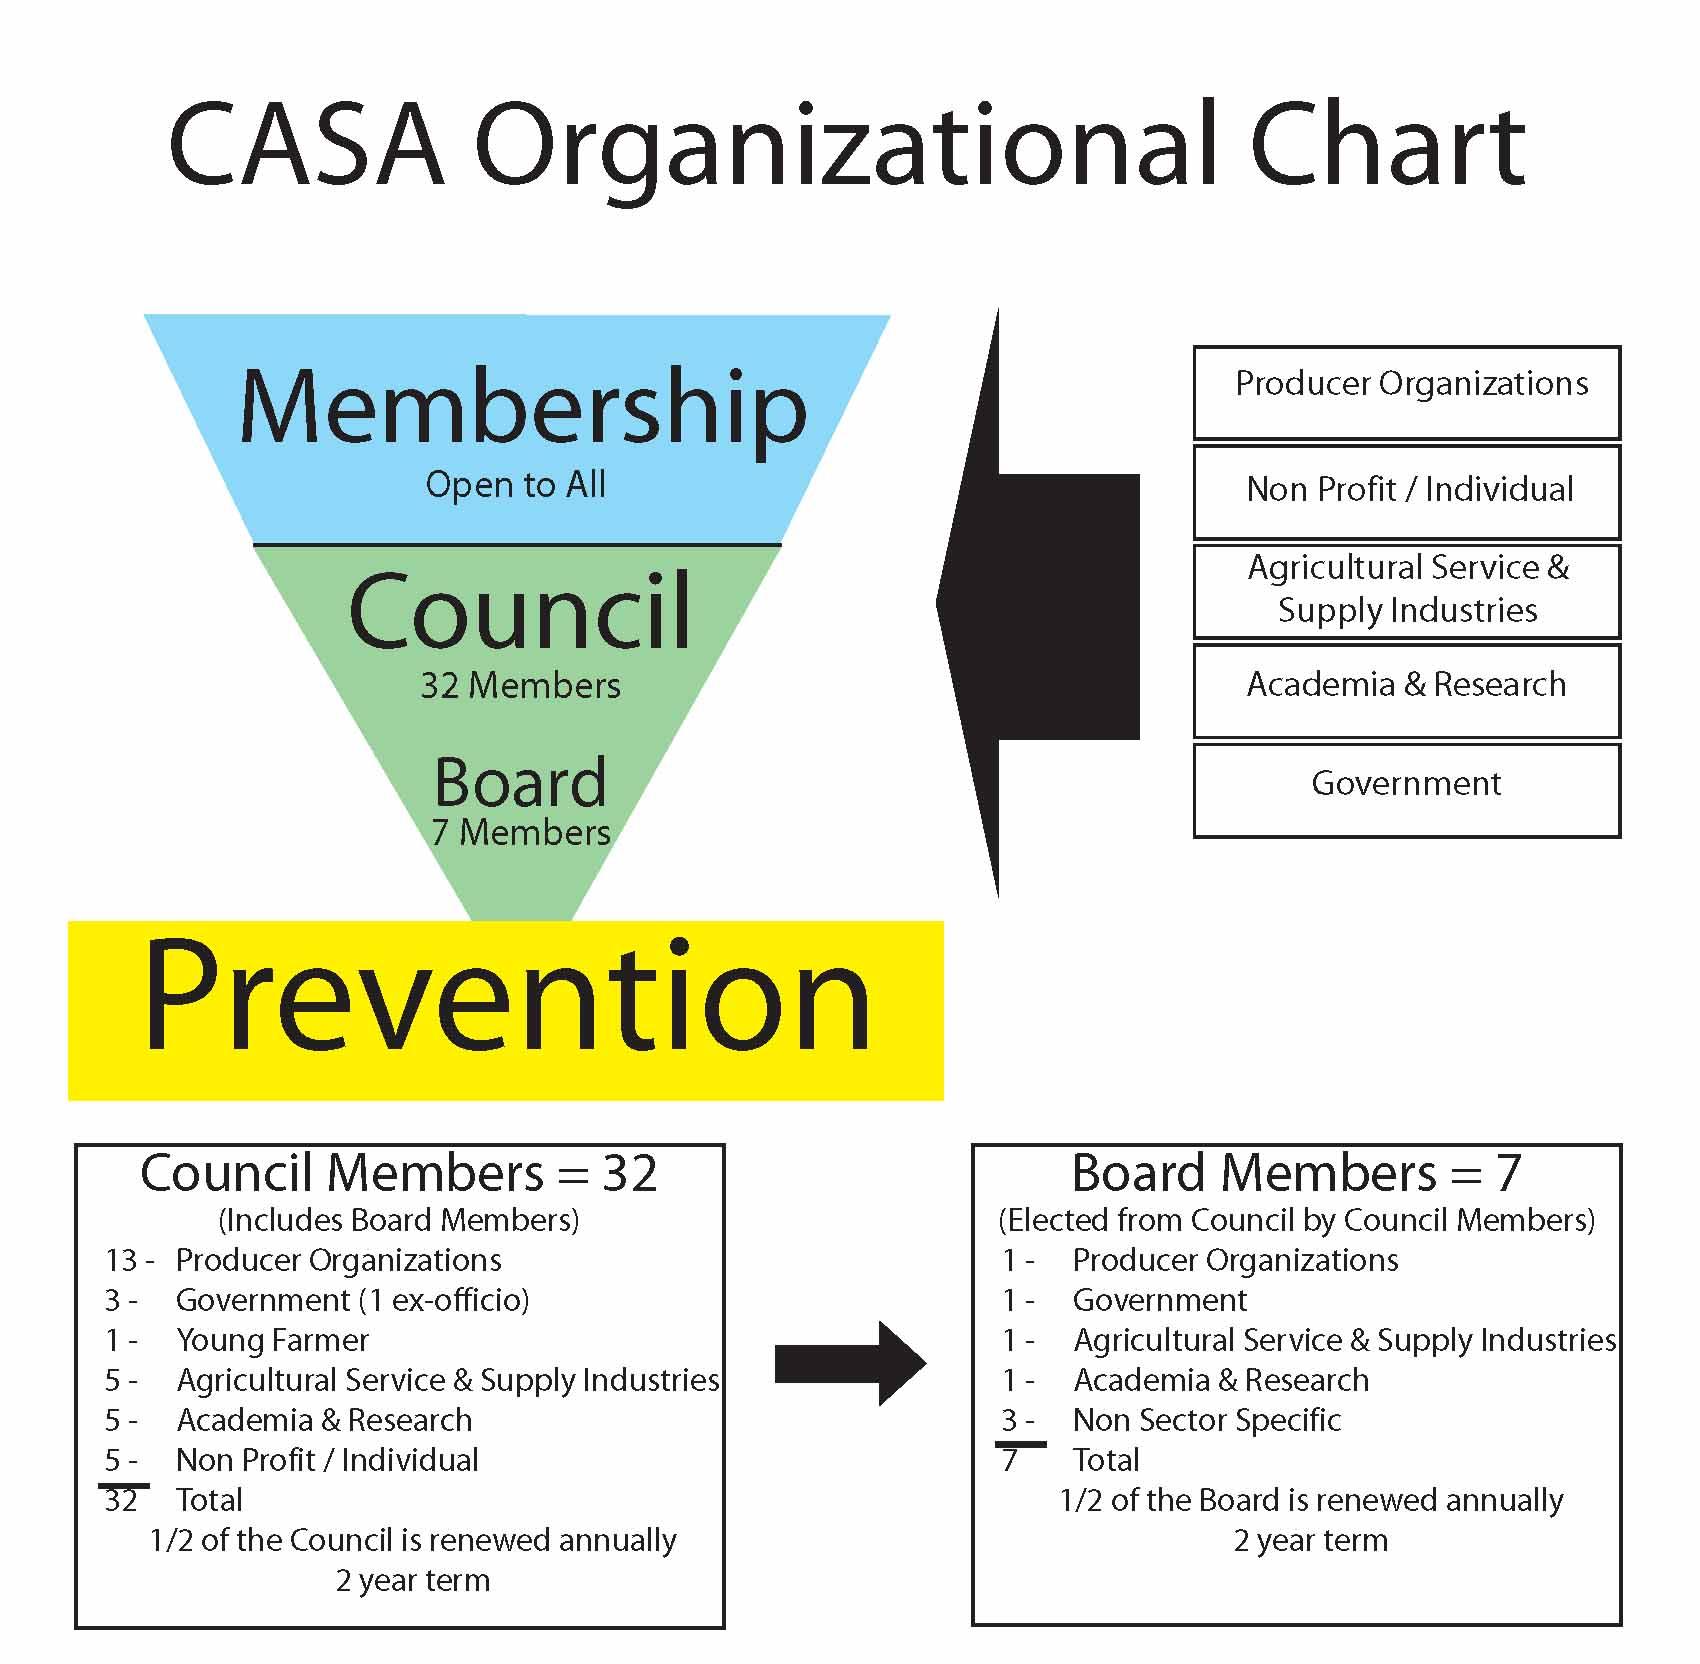 Non Profit Structure Organizational Chart: CASA Organizational Structure1.jpg - Wikipedia,Chart